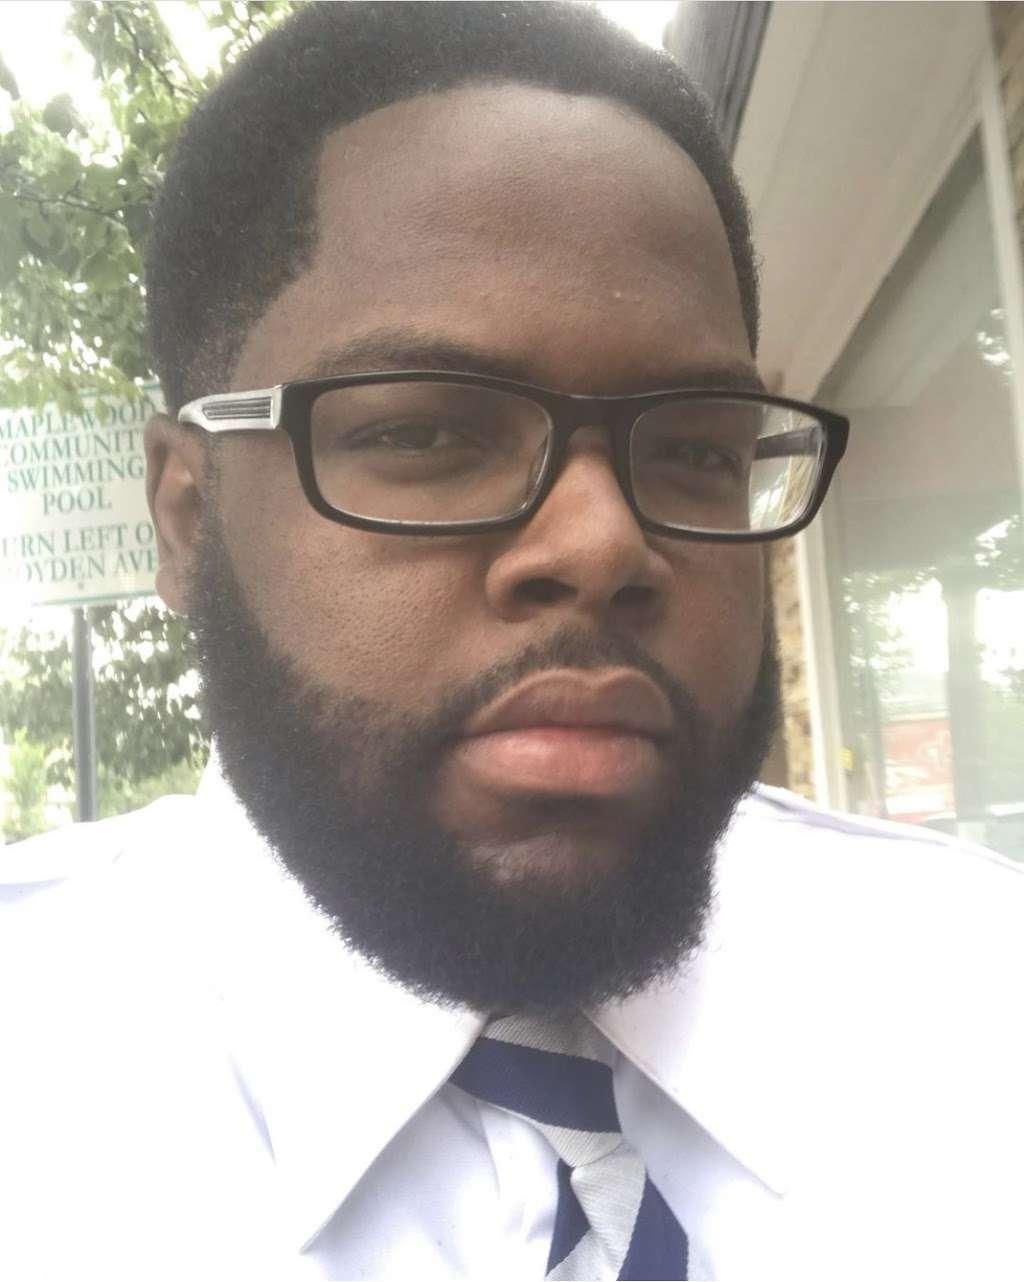 Headliner LLC - hair care  | Photo 5 of 6 | Address: 1551 Springfield Ave, Maplewood, NJ 07040, USA | Phone: (973) 378-5941